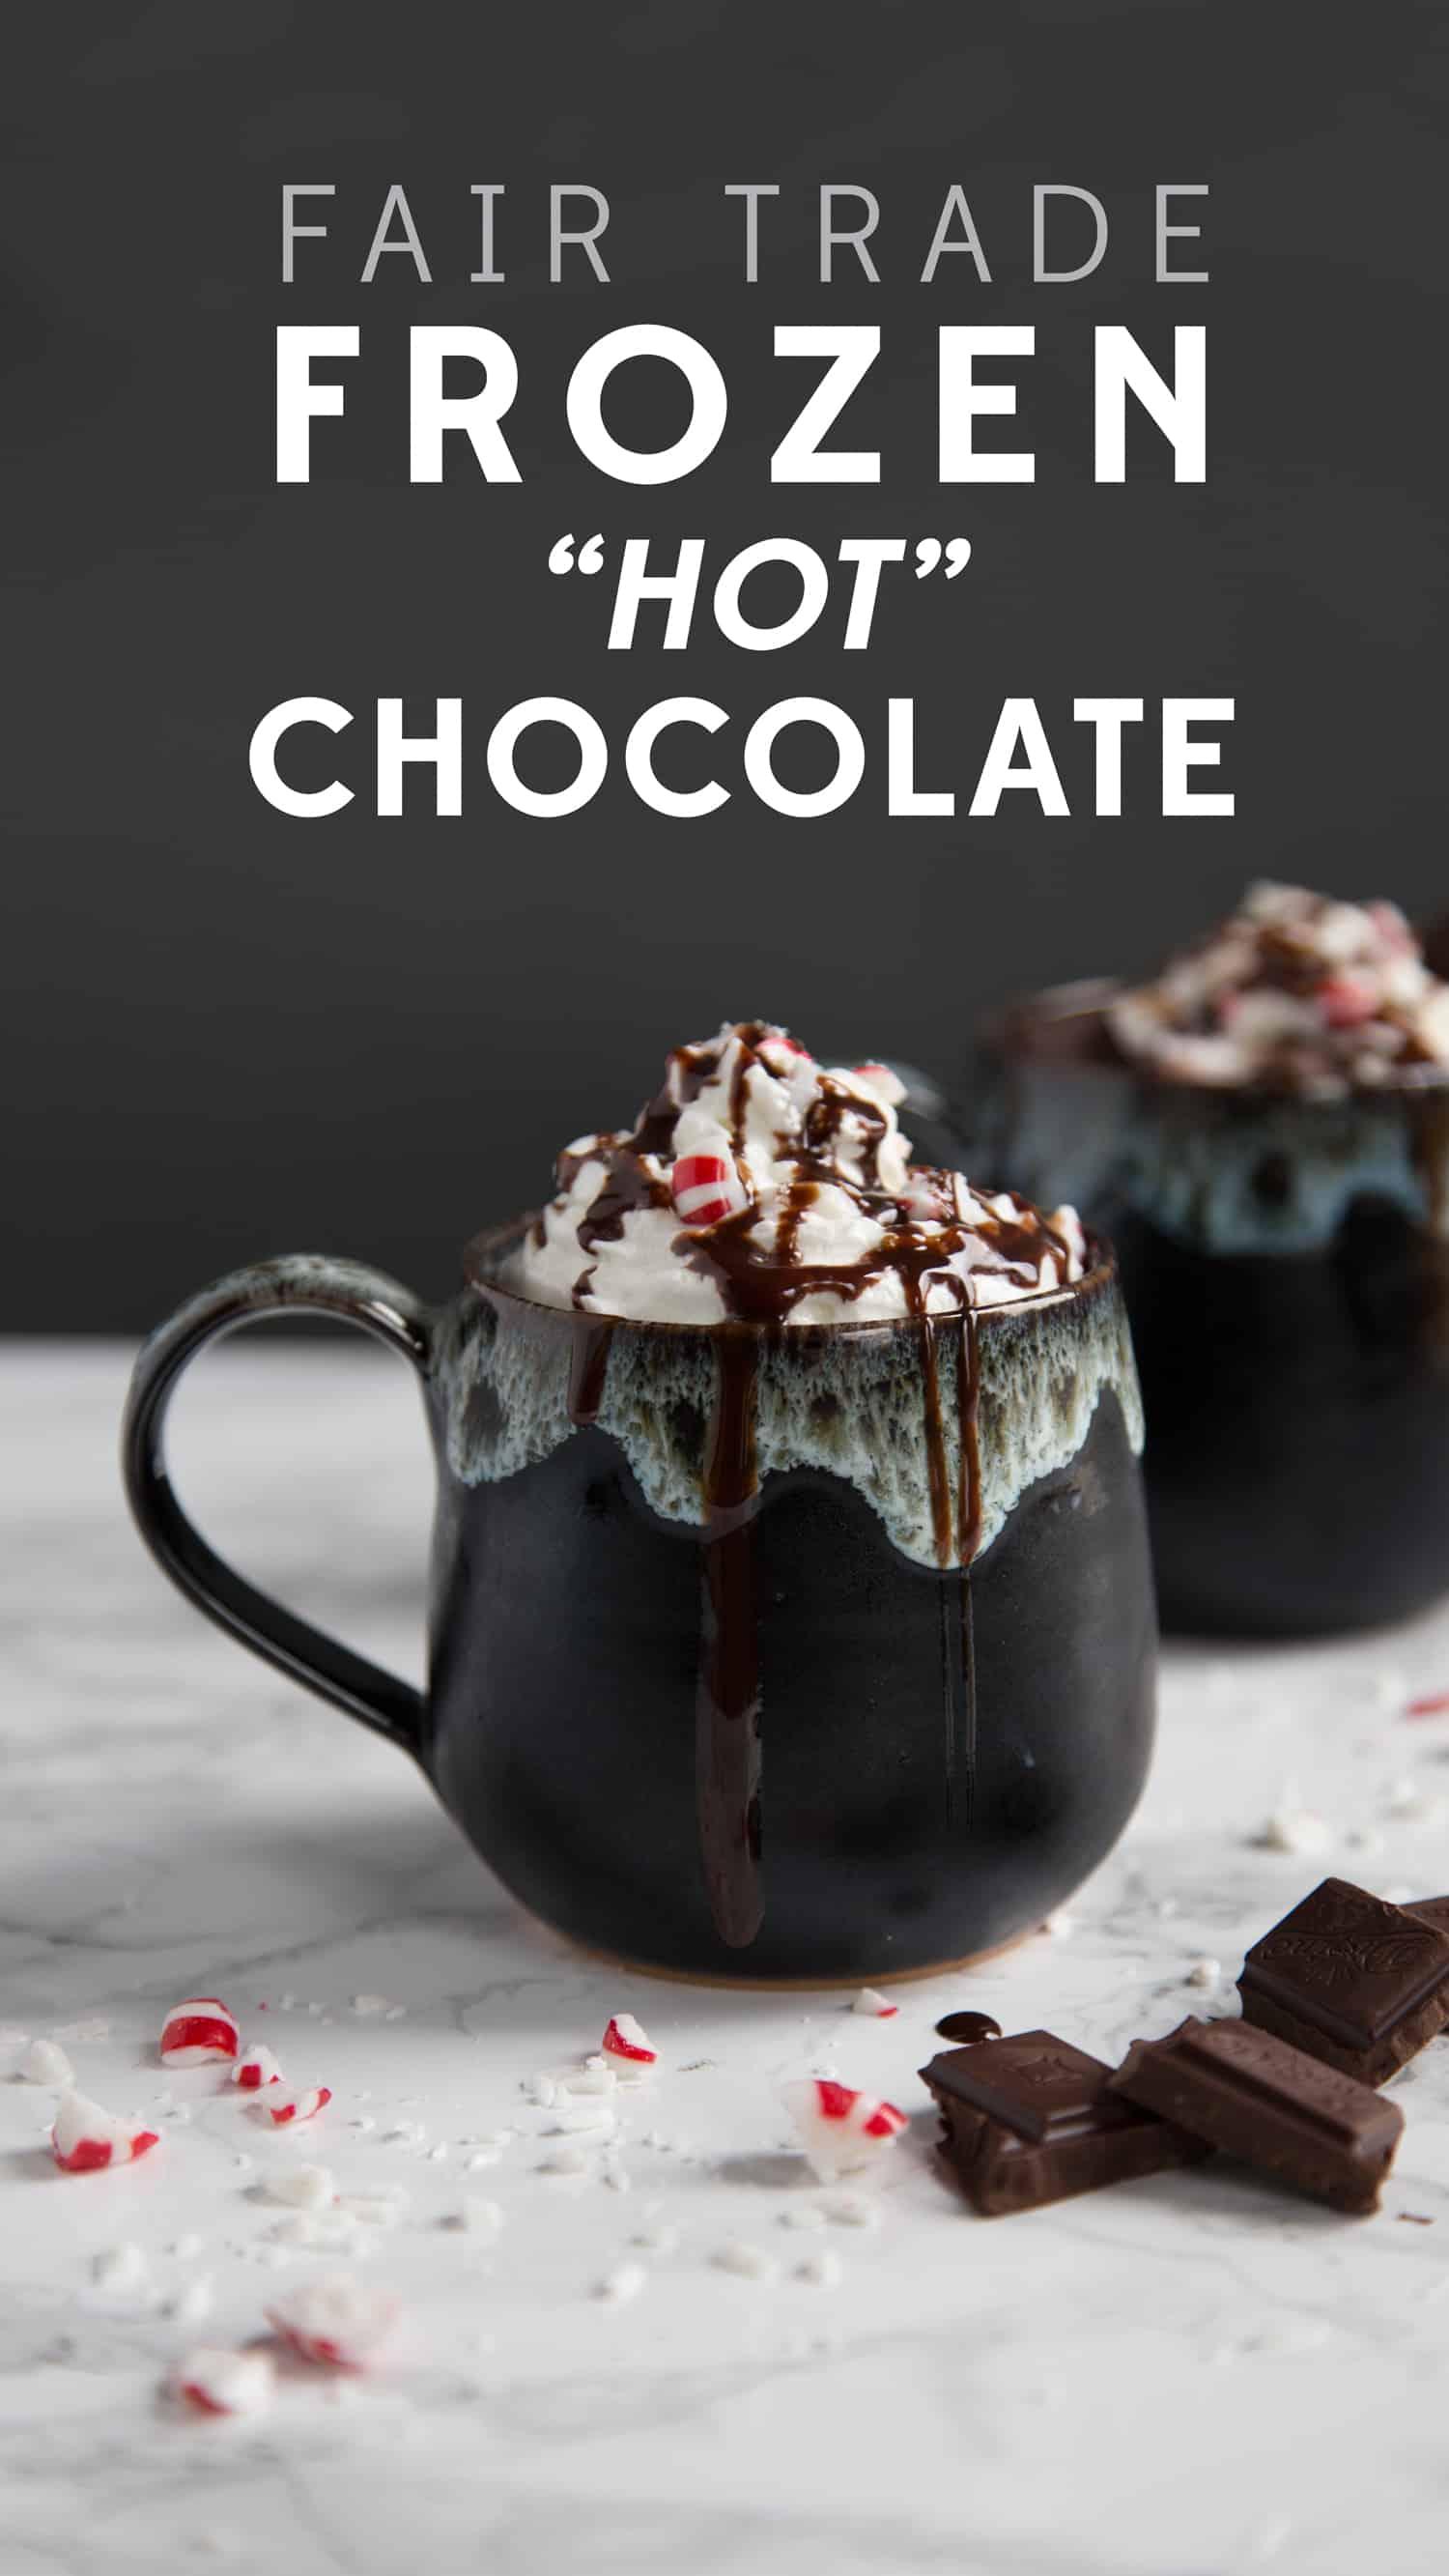 Frozen hot chocolate